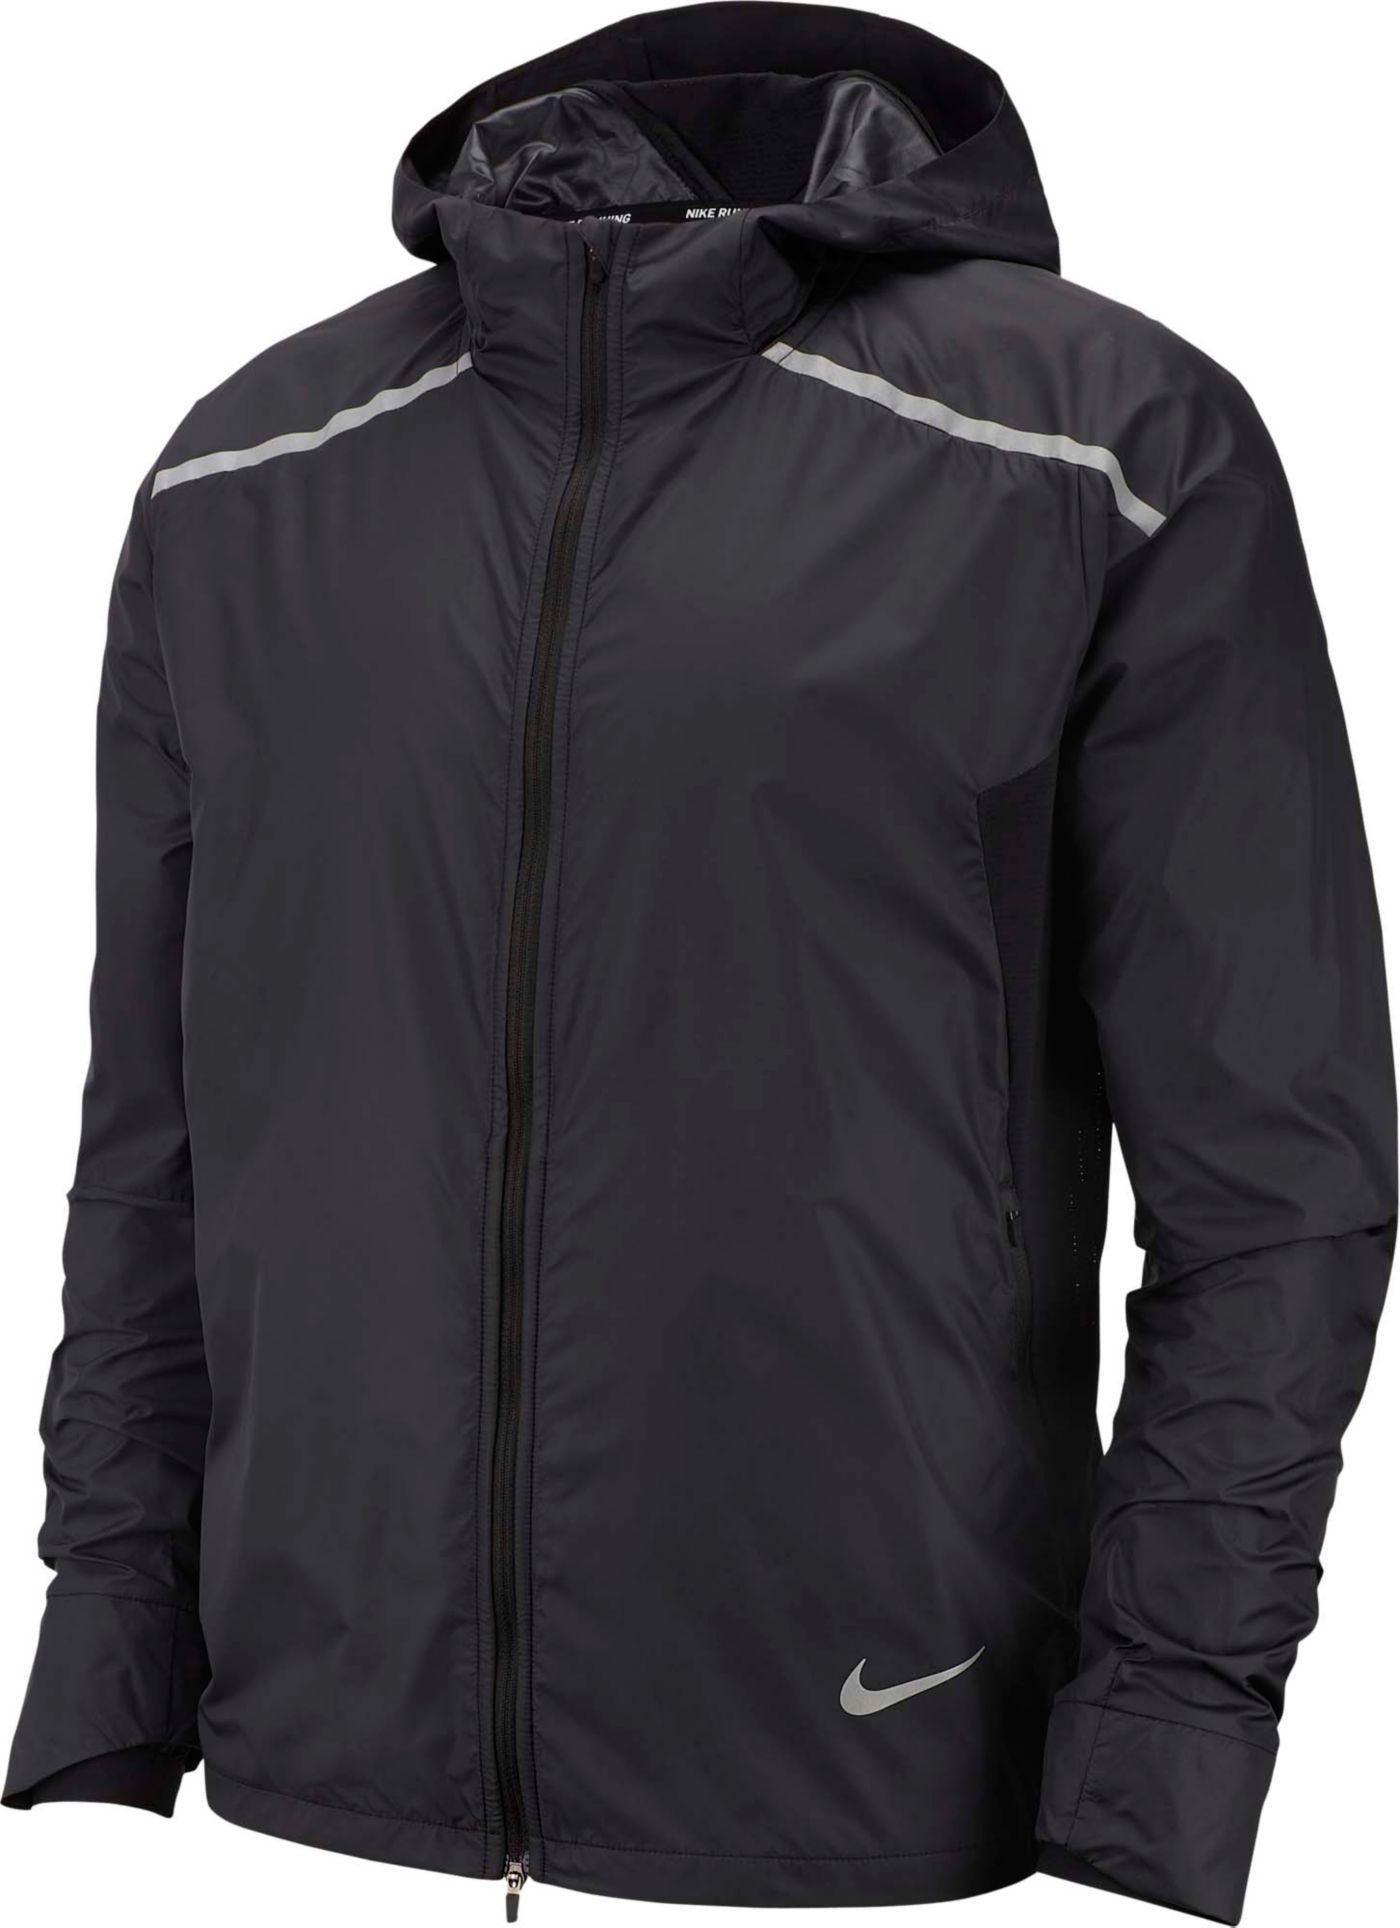 Nike Men's Repel Hooded Running Jacket